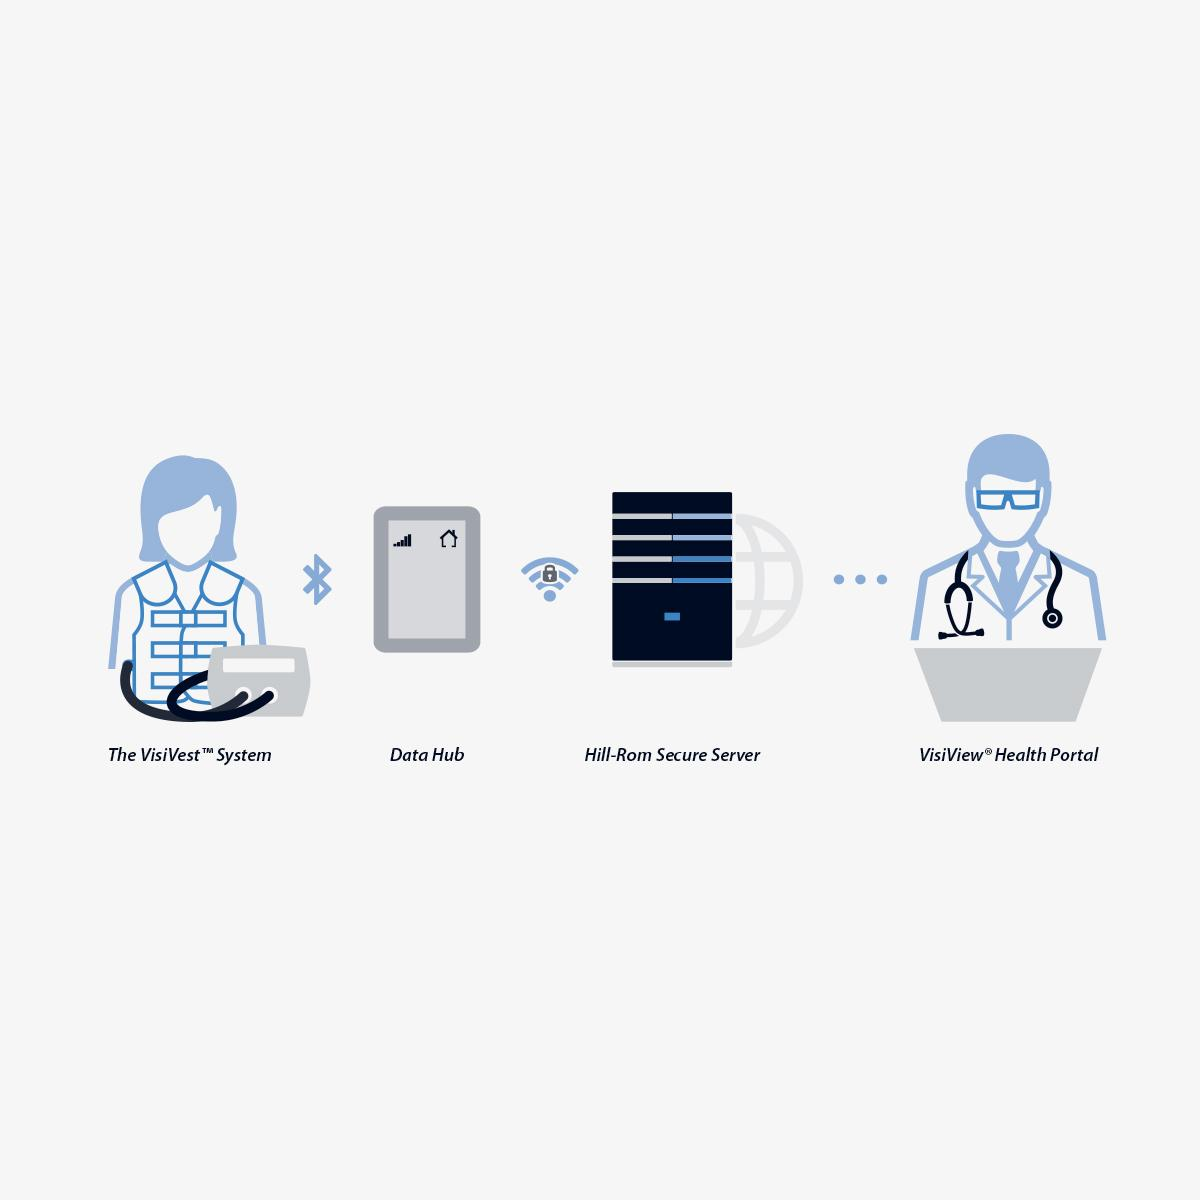 VisiView Health Portal